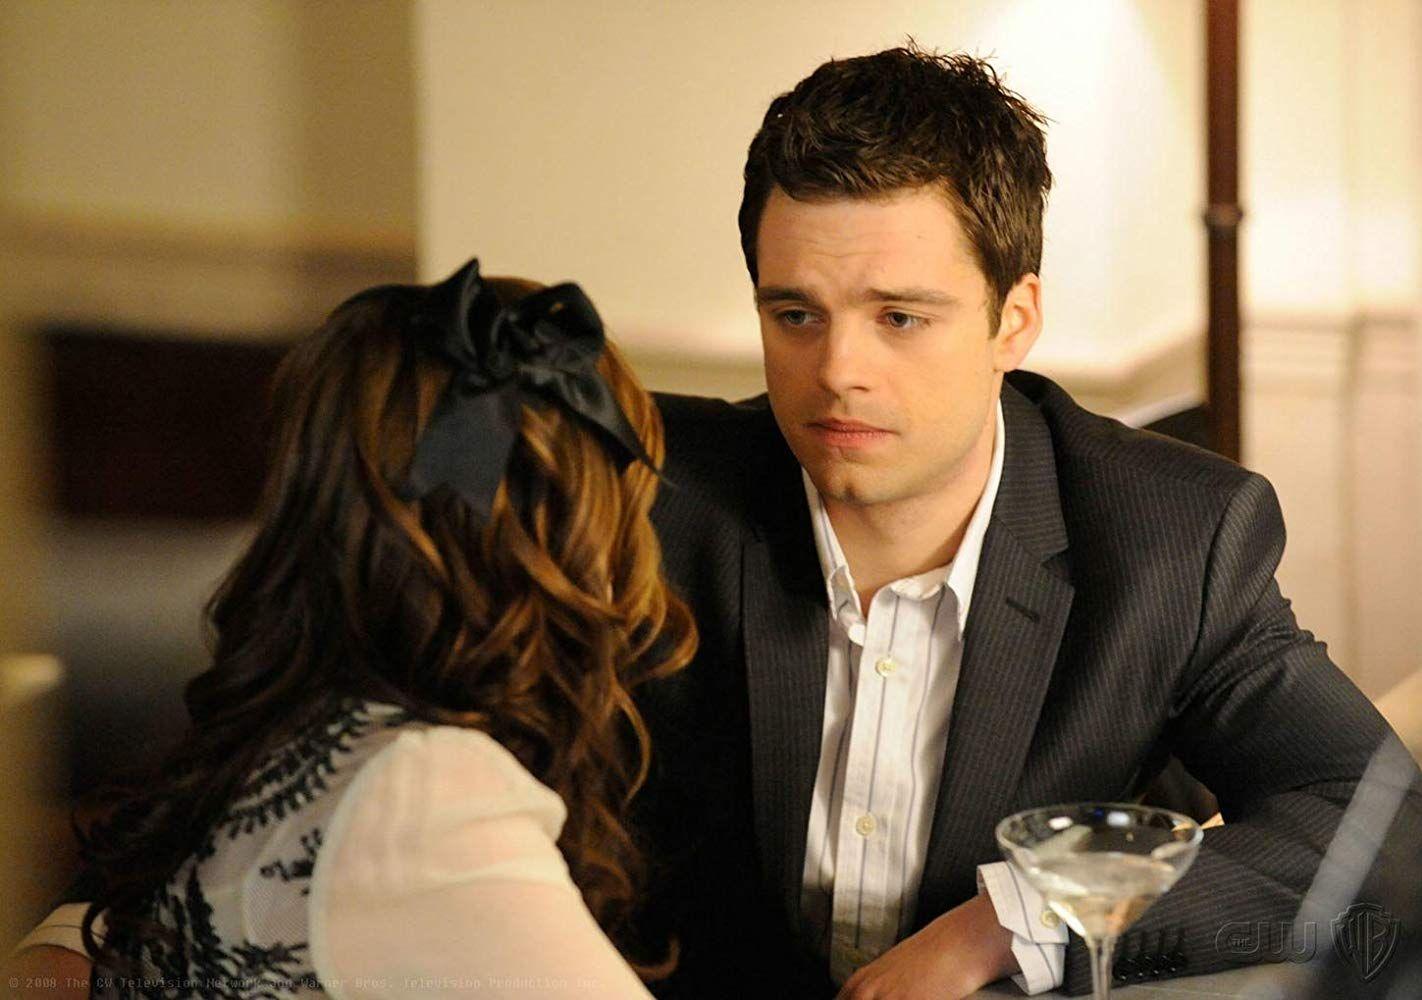 Blair (Leighton Meester) e Carter (Sebastian Stan) em Gossip Girl